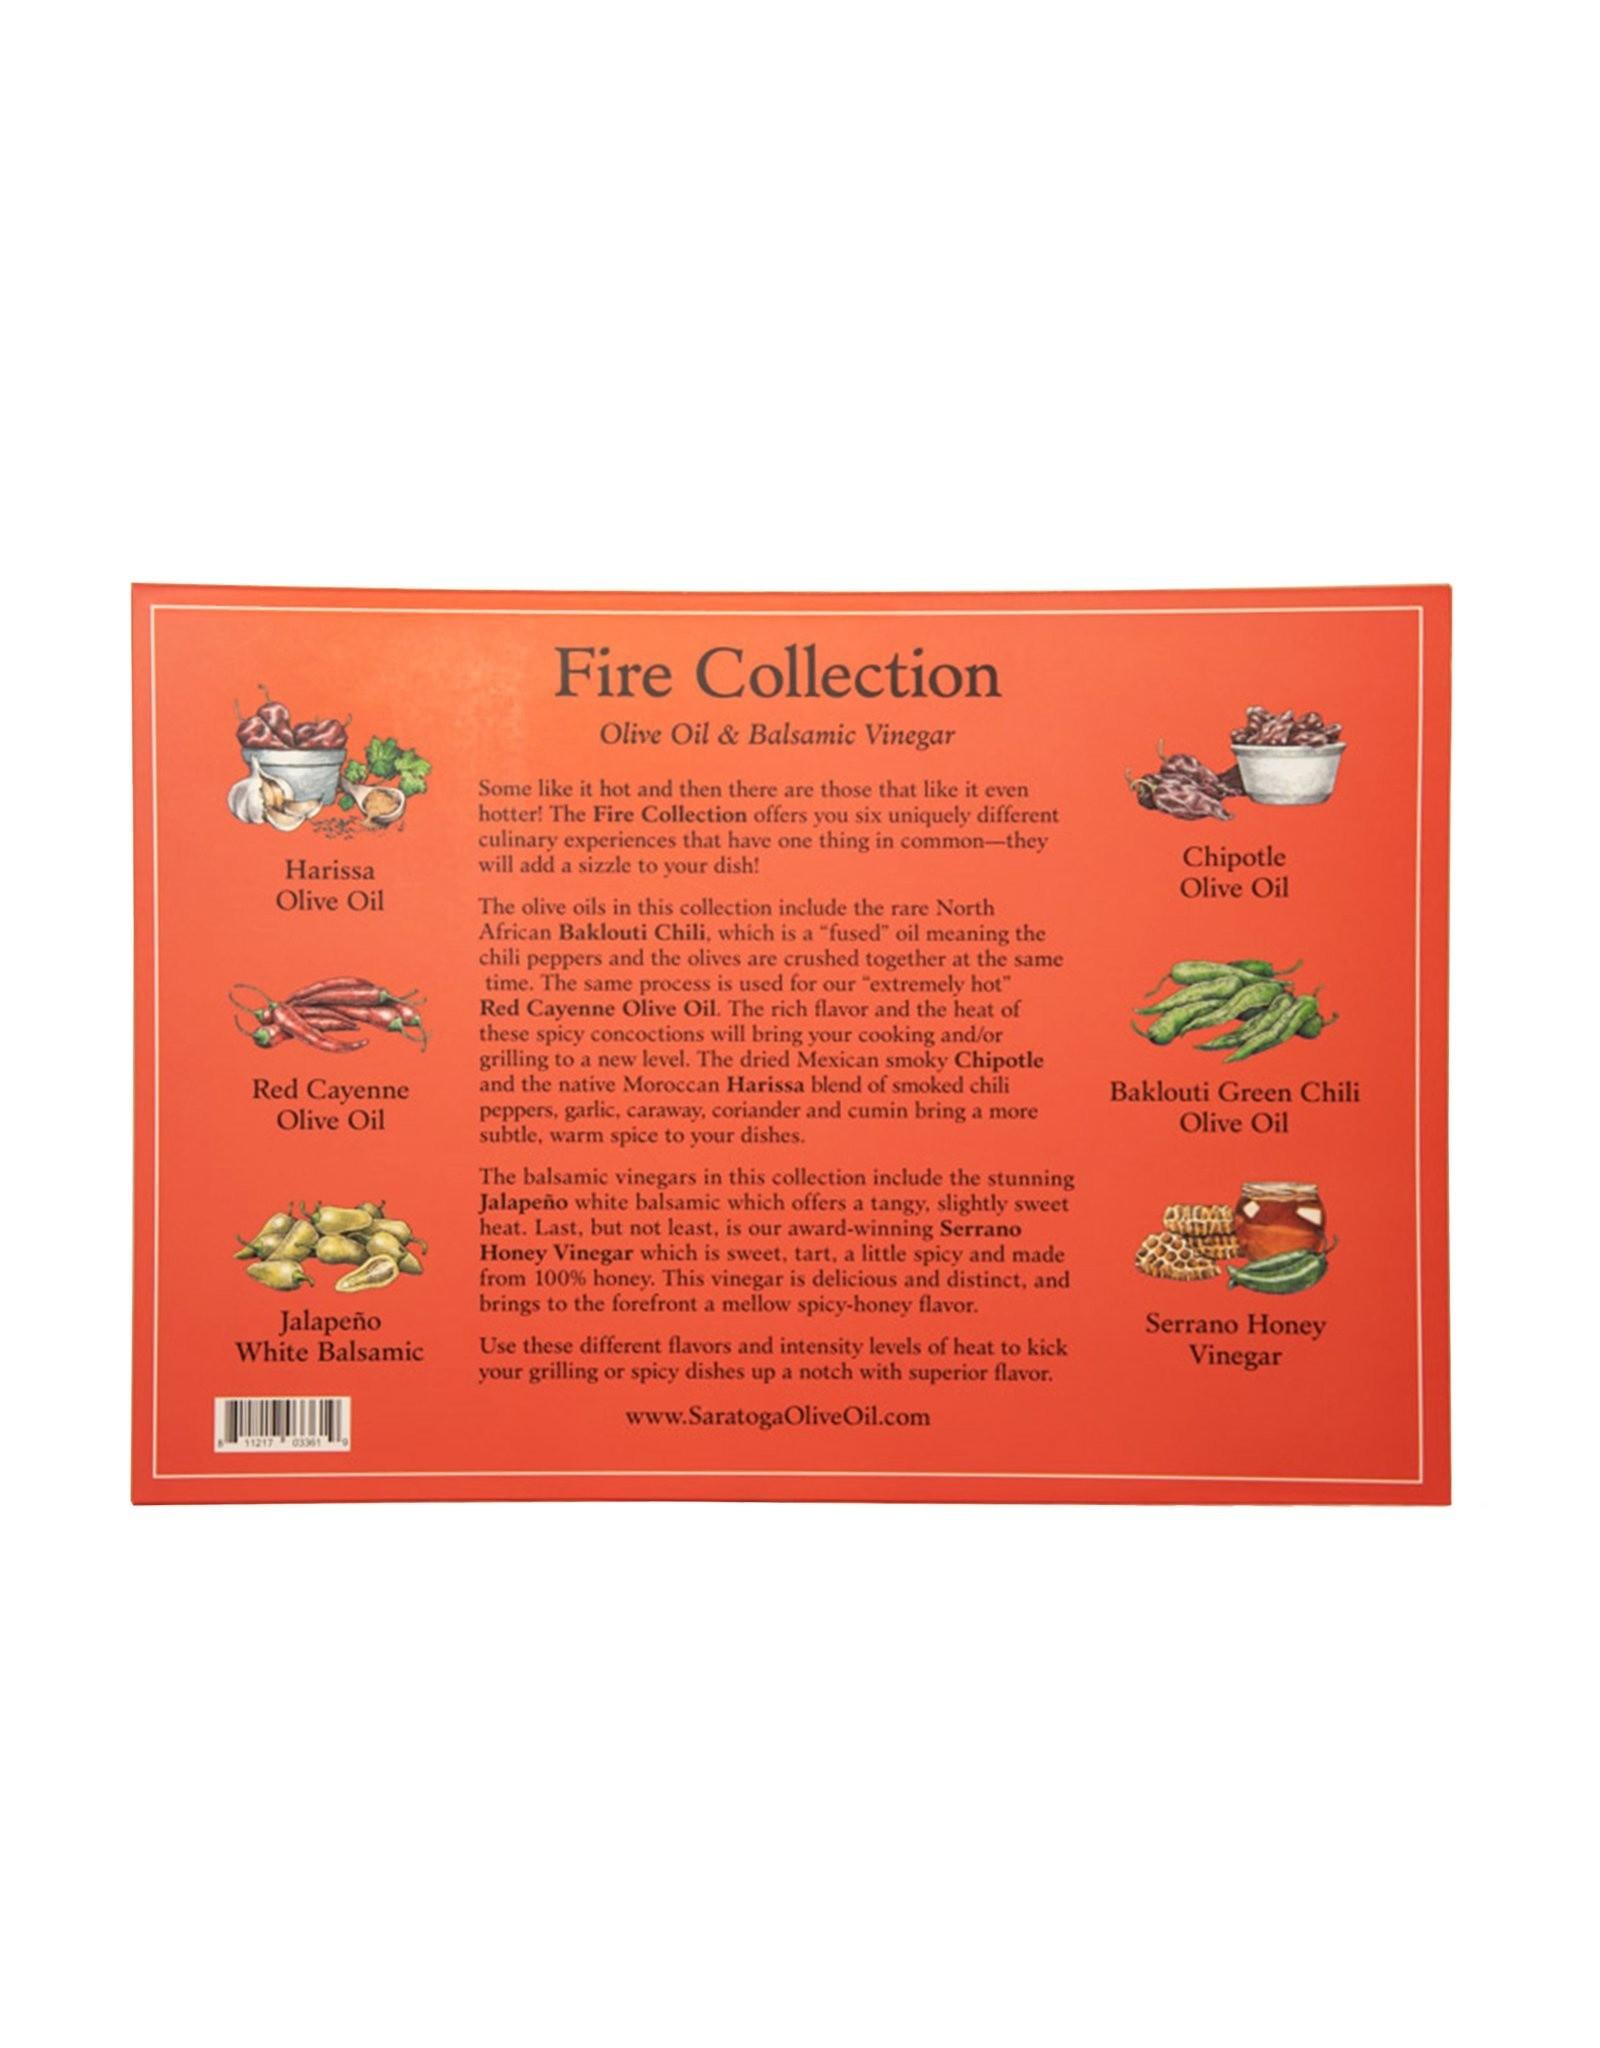 Saratoga Olive Oil Company Fire Collection